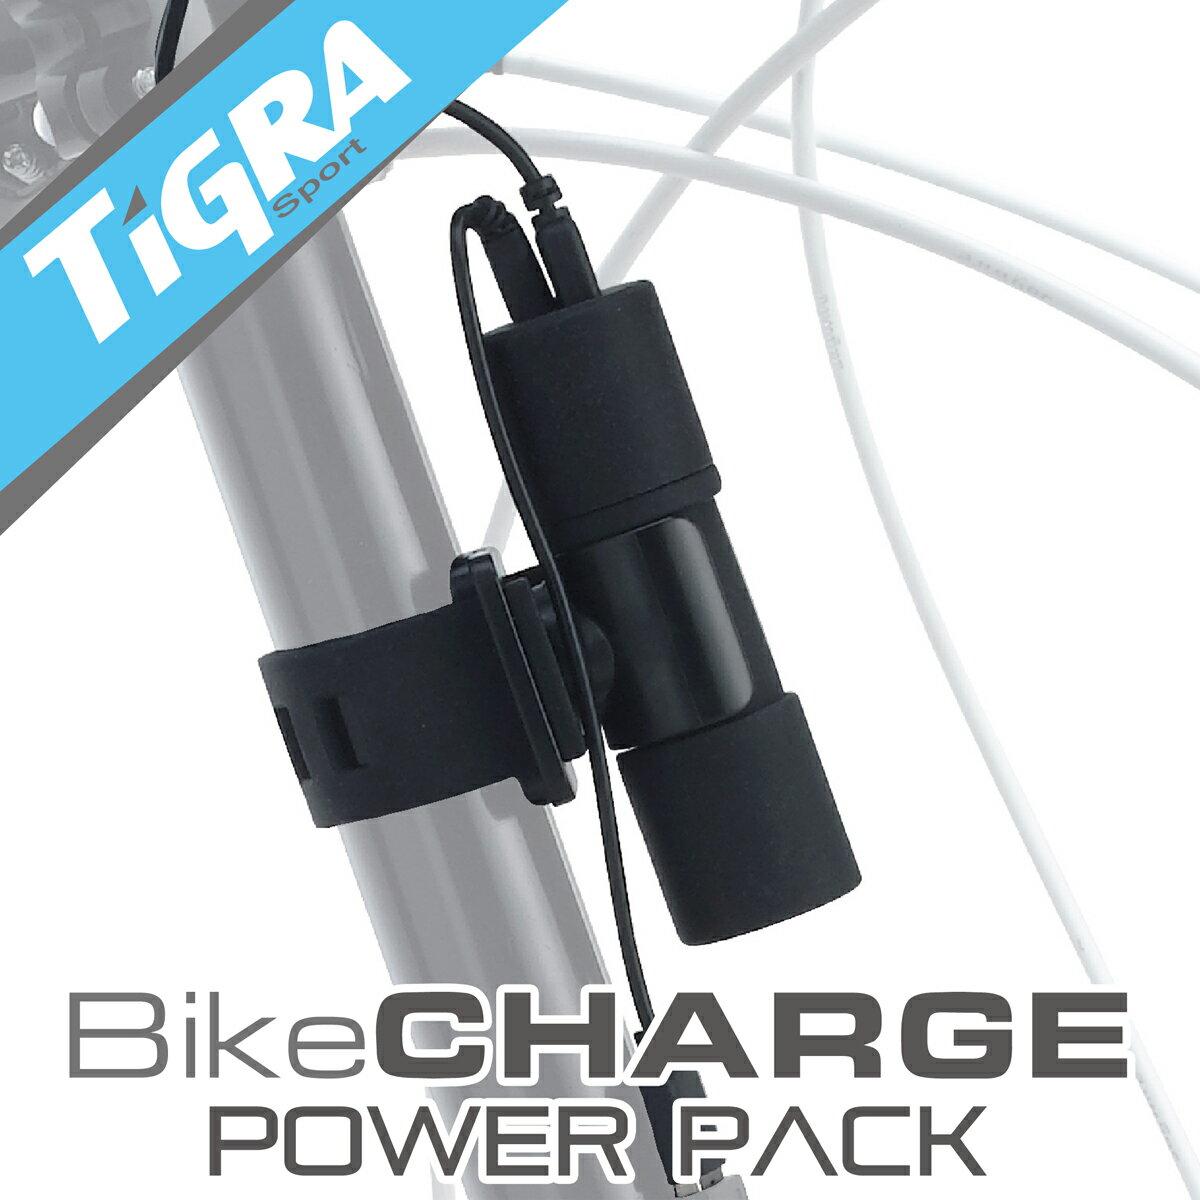 TiGRA Sport モバイルバッテリー スマホ iPhone6s plus バイク Xperia BCP-2600|iphone 防水 スマートフォン ホルダー 自転車 スマホホルダー アイフォン 7 6 ロードバイク アイホン バッテリー 全機種対応 SE 5s 5 送料無料 モバイル 携帯バッテリー 携帯 充電器 持ち運び